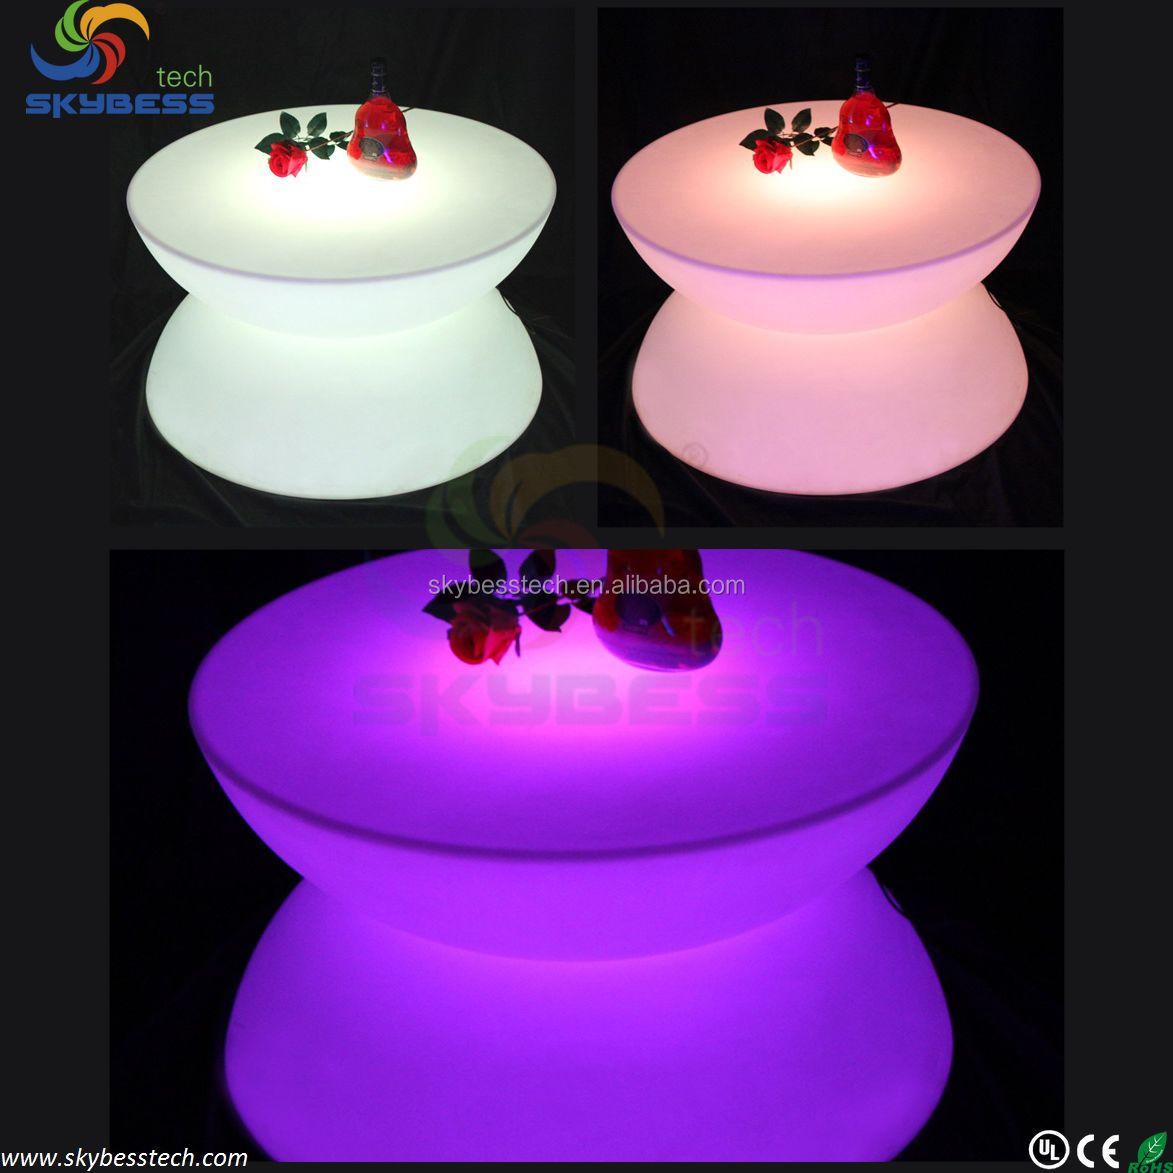 LED Table Lighting, Illuminated Bar Tables,RGB LED Bar Table SK-LF16 (D80*H44cm) free shipping 1pc joseph h keenan gas tables